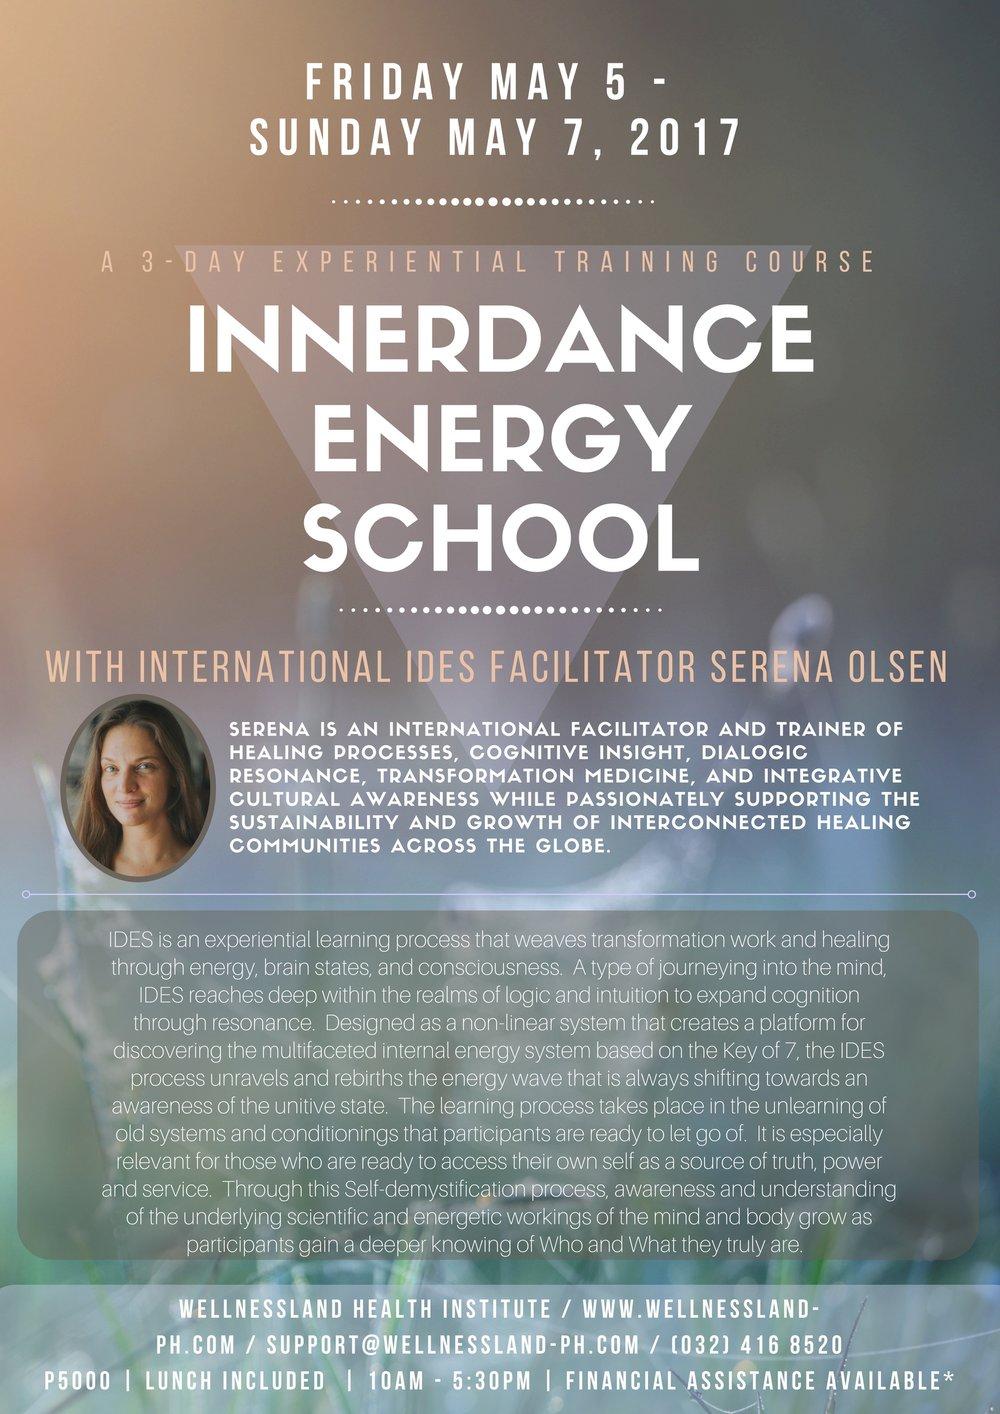 innerdance energy school